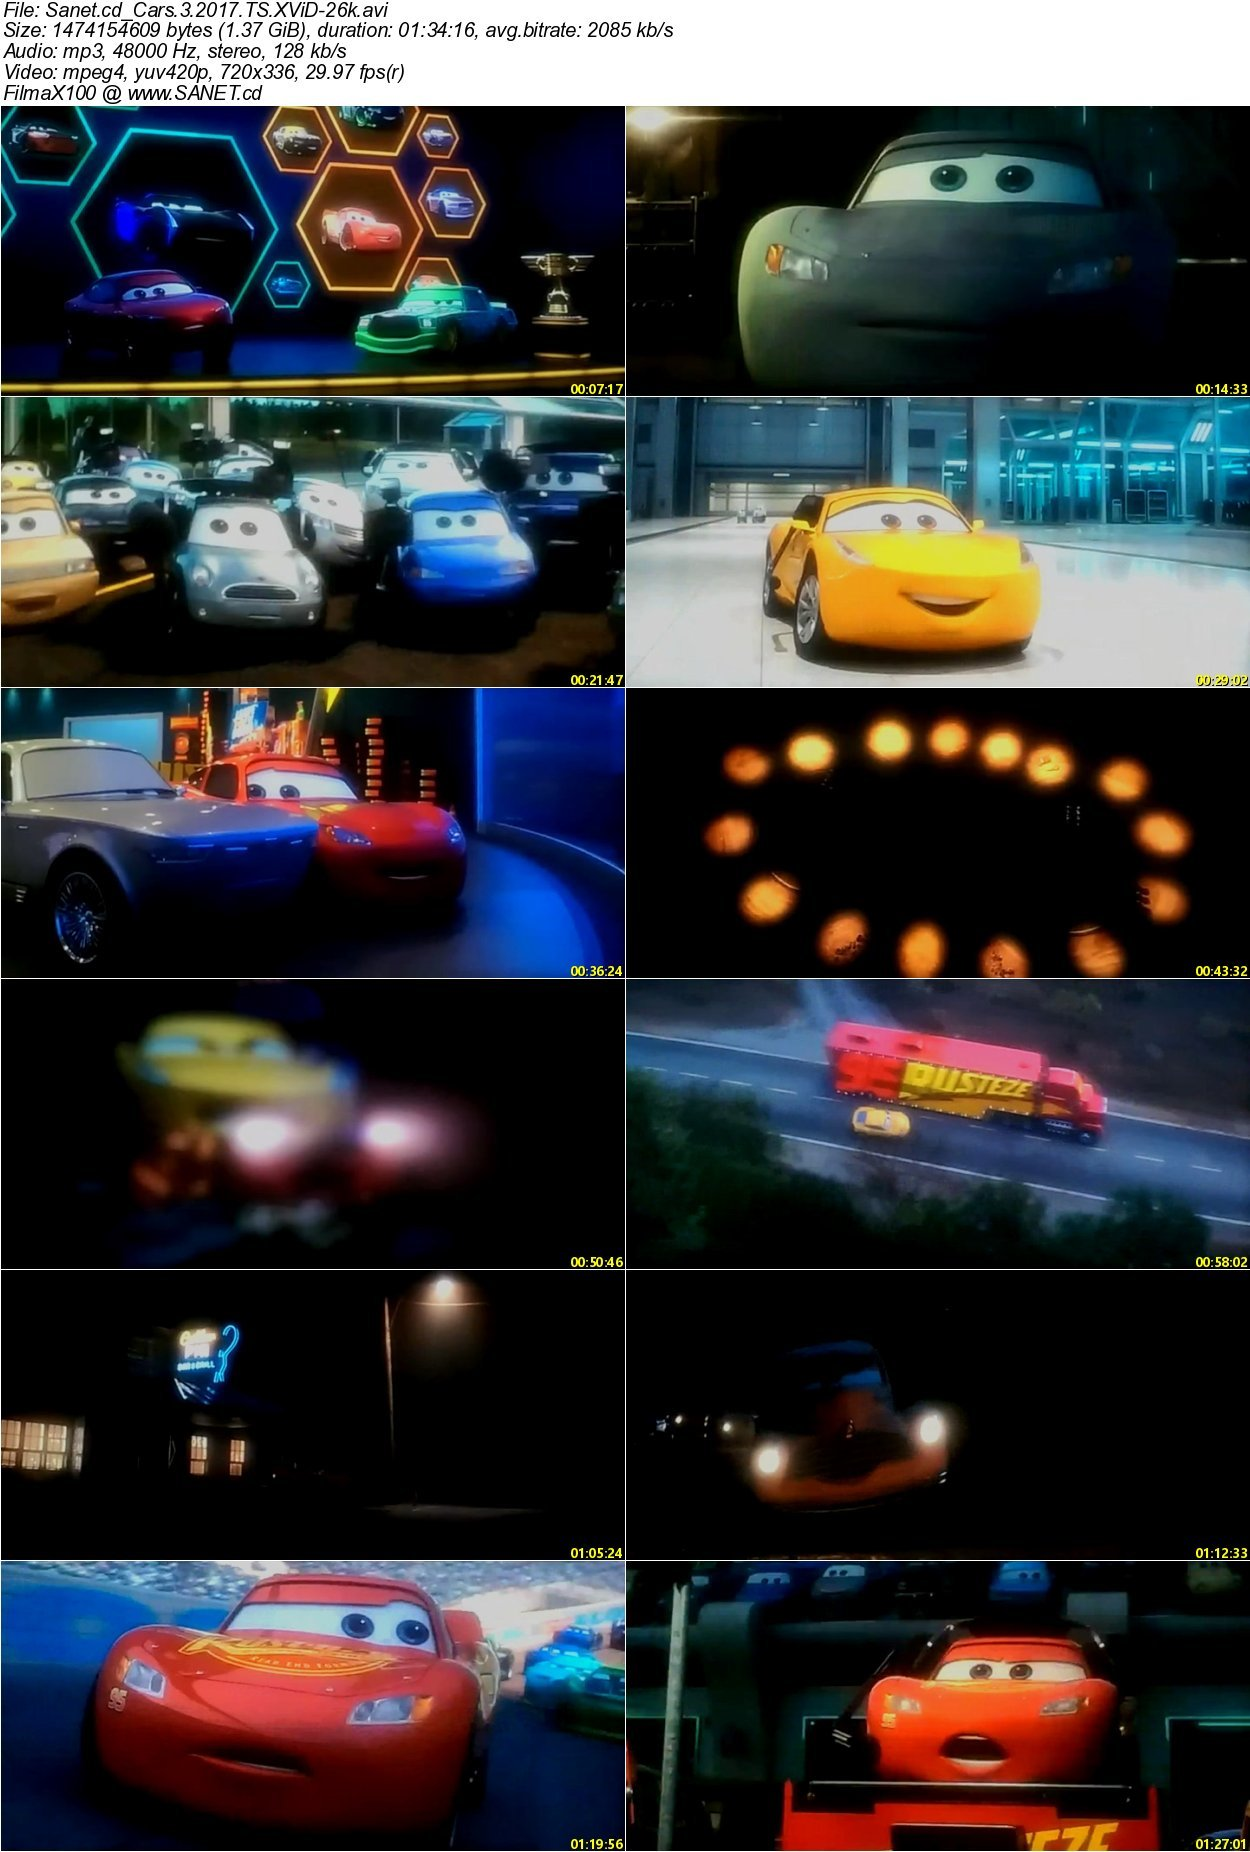 Cars 2 2017 Dvdrip Xvid Max Voipila